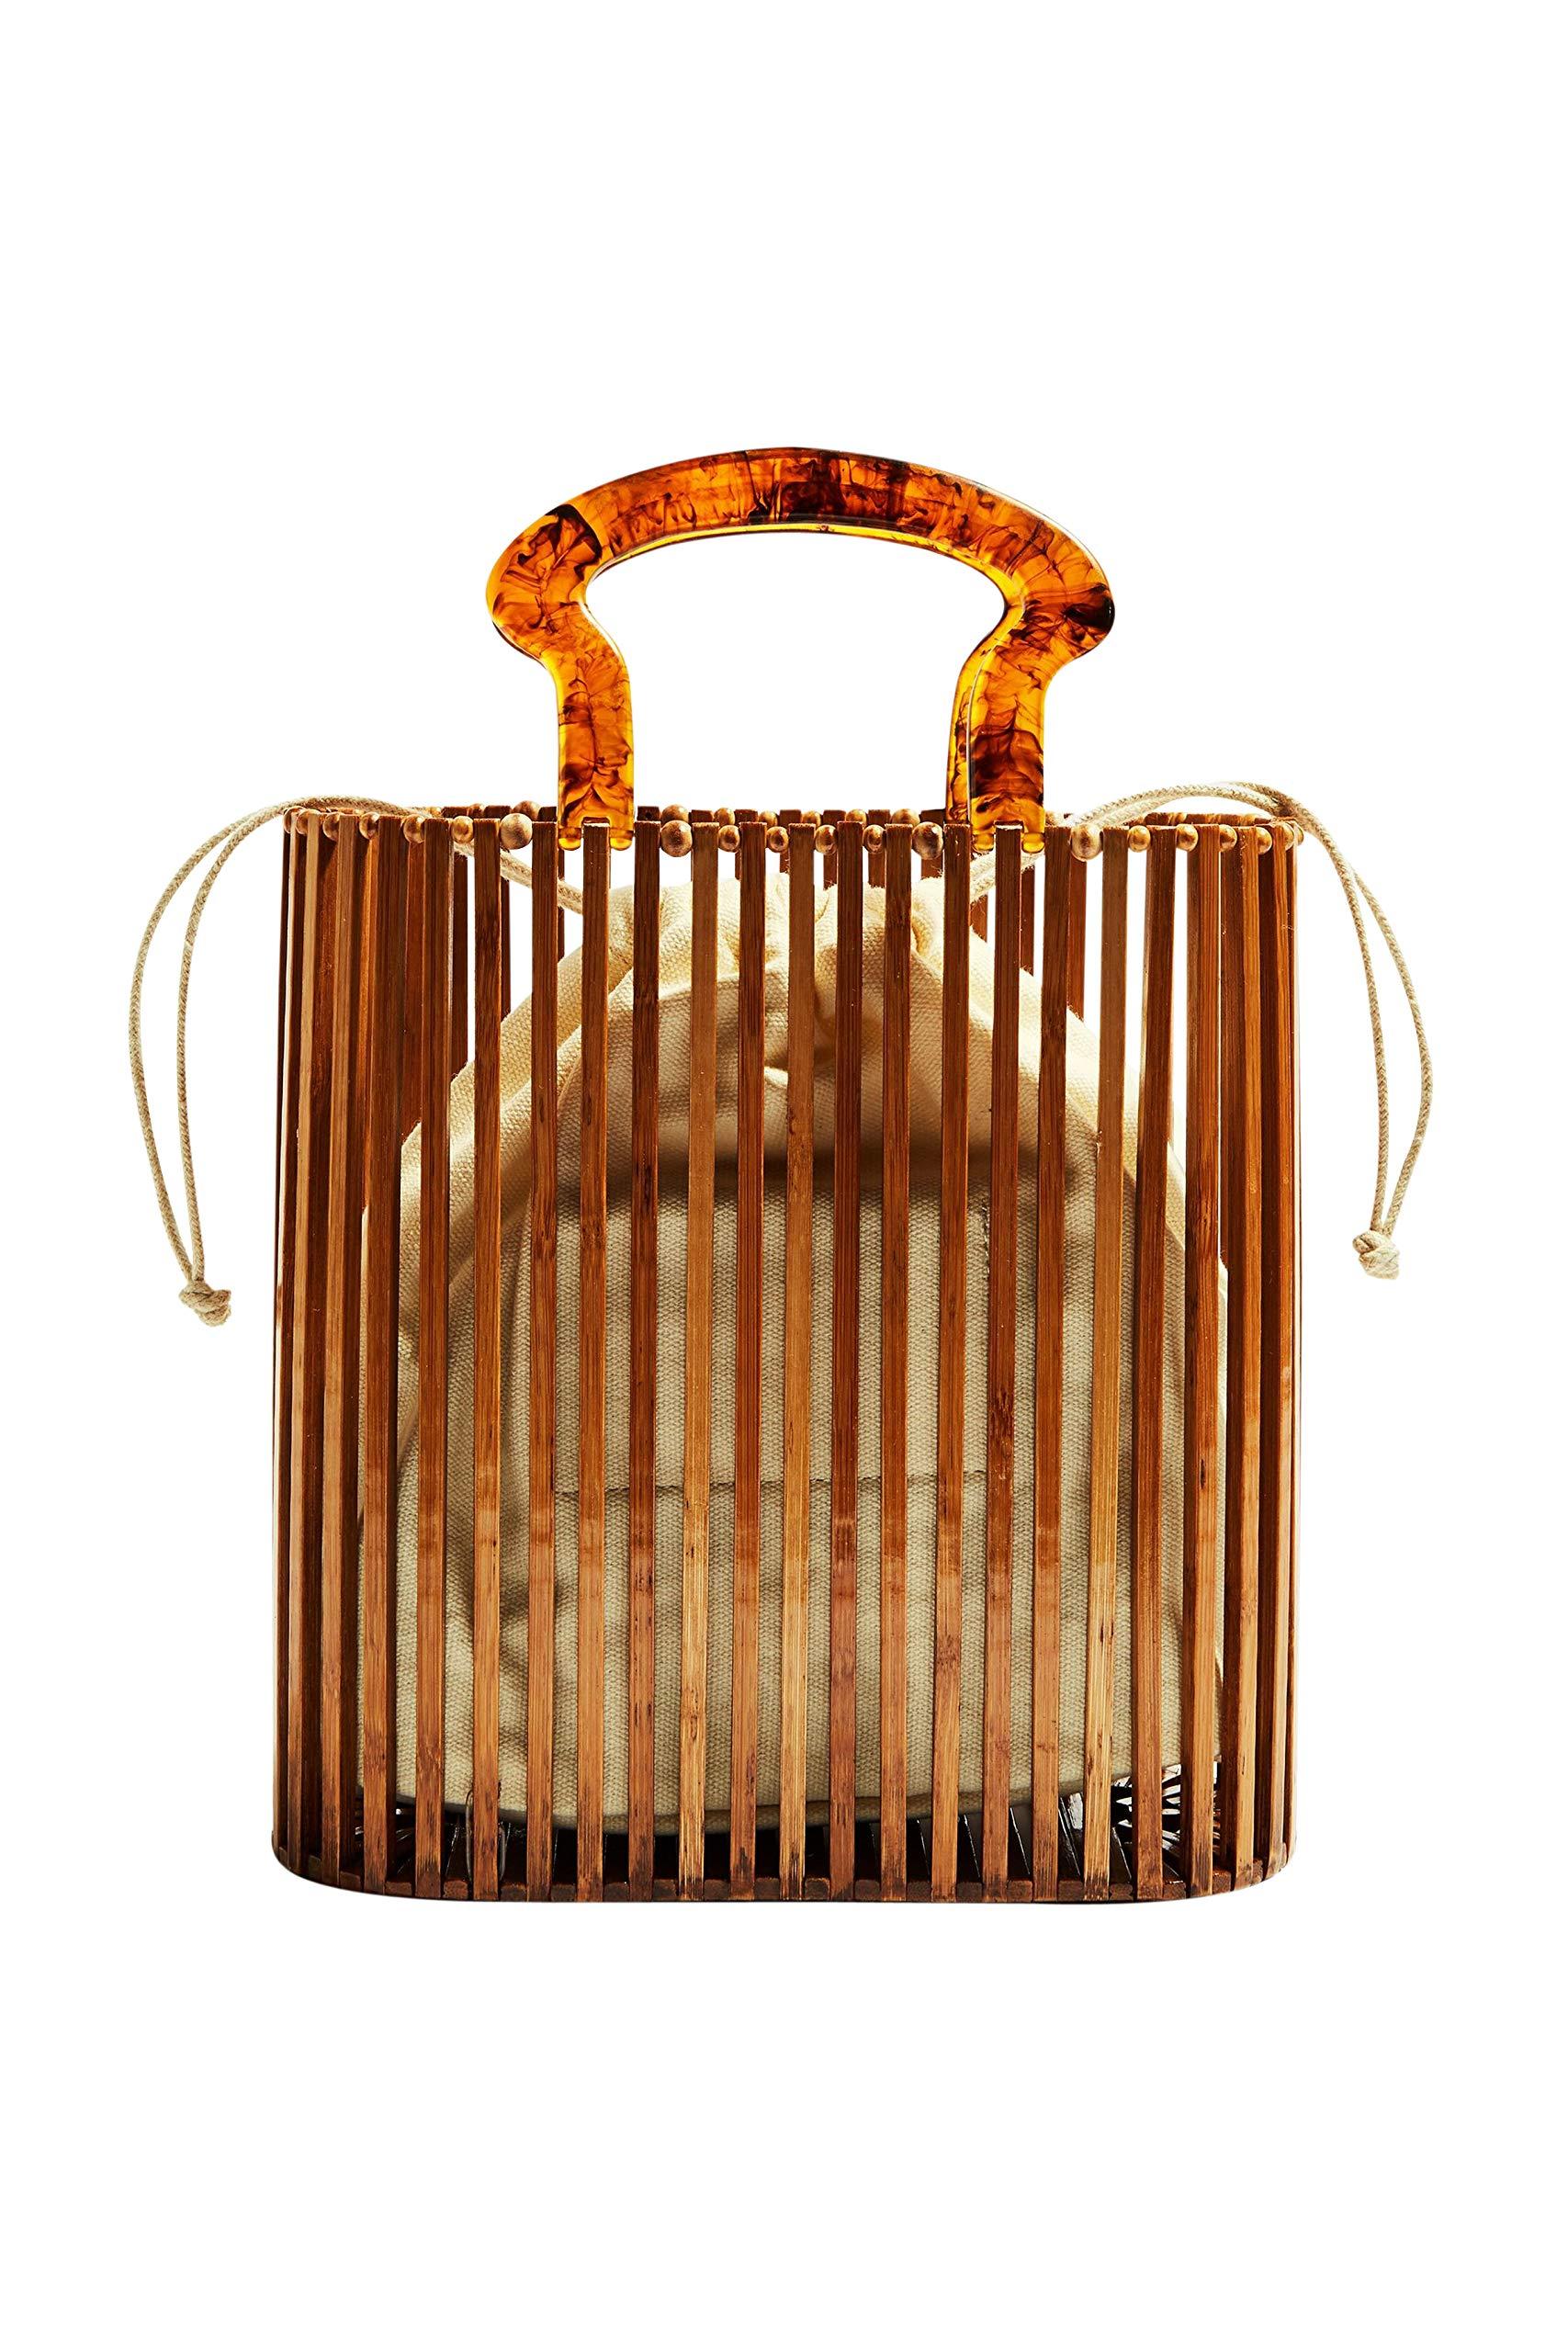 Handmade Bamboo Beach Bag Wooden Handmade Tote Womens Straw Tote Bag Womens Basket Bag Large for Women